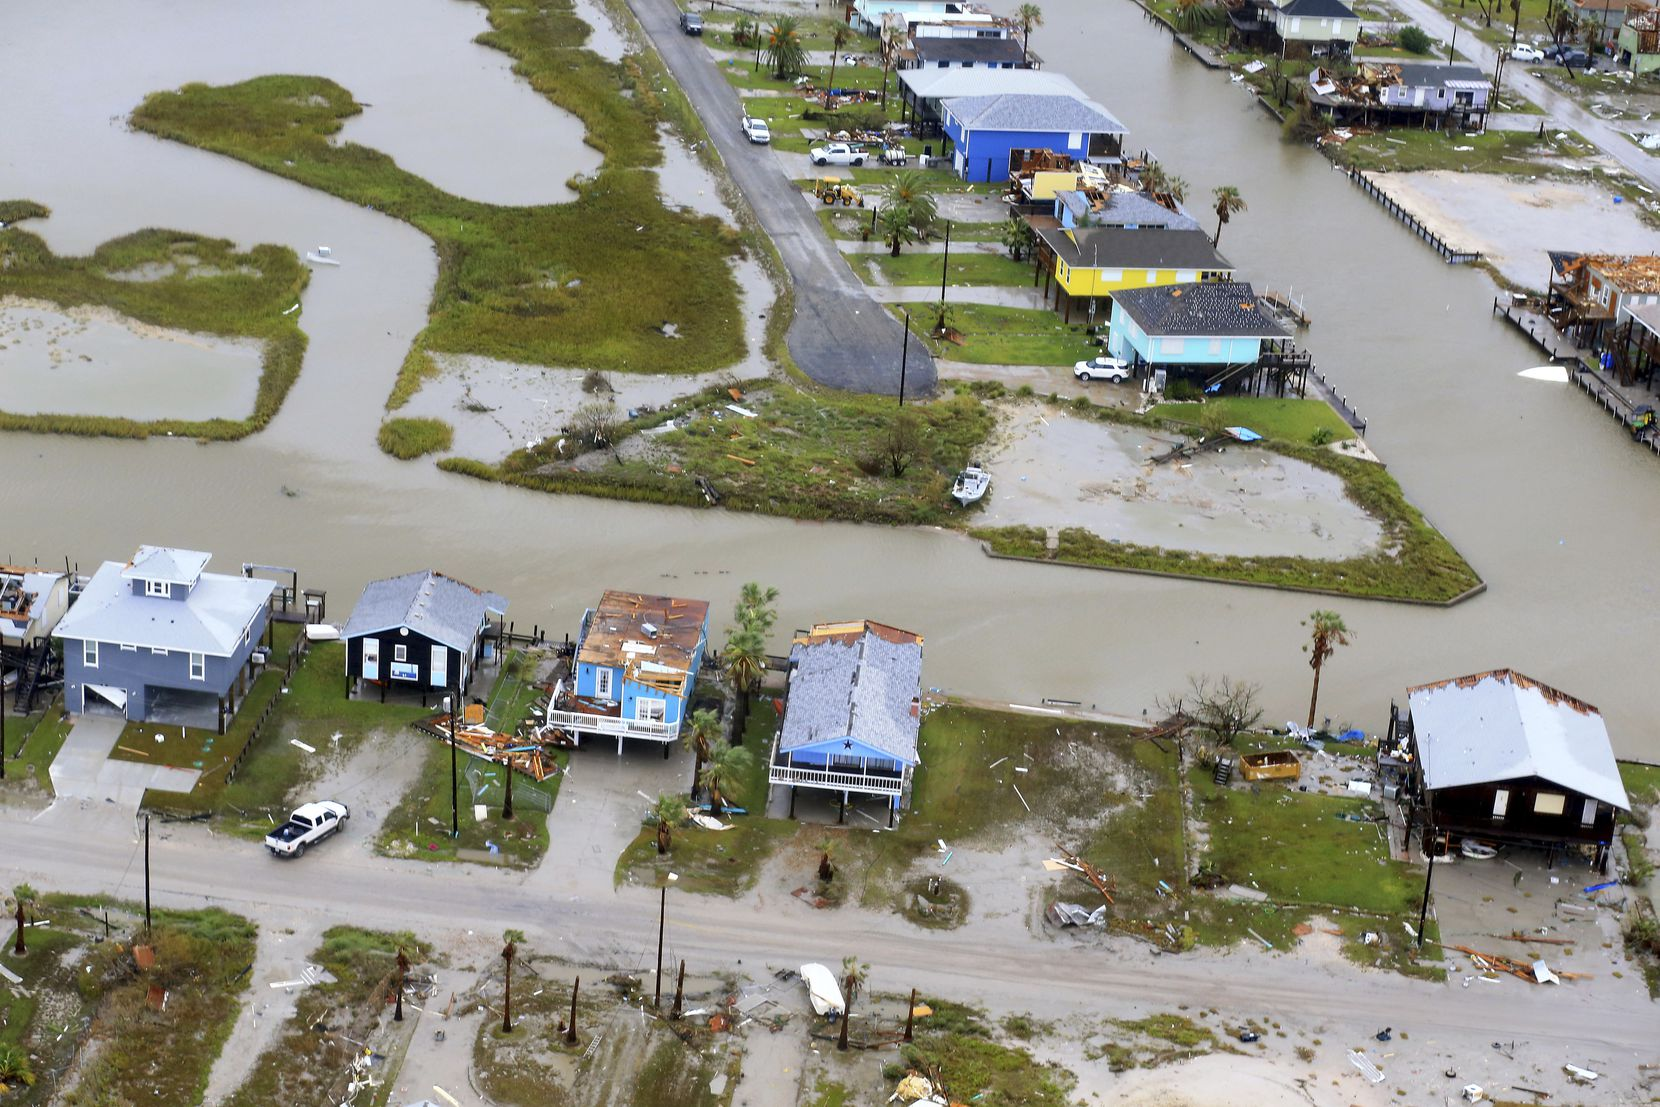 This aerial photo shows damaged homes after Hurricane Harvey, Monday, August 28, 2017, in Corpus Christi, Texas.  Harvey hit the coast as a Category 4 hurricane (Gabe Hernandez / Corpus Christi Caller-Times via AP)